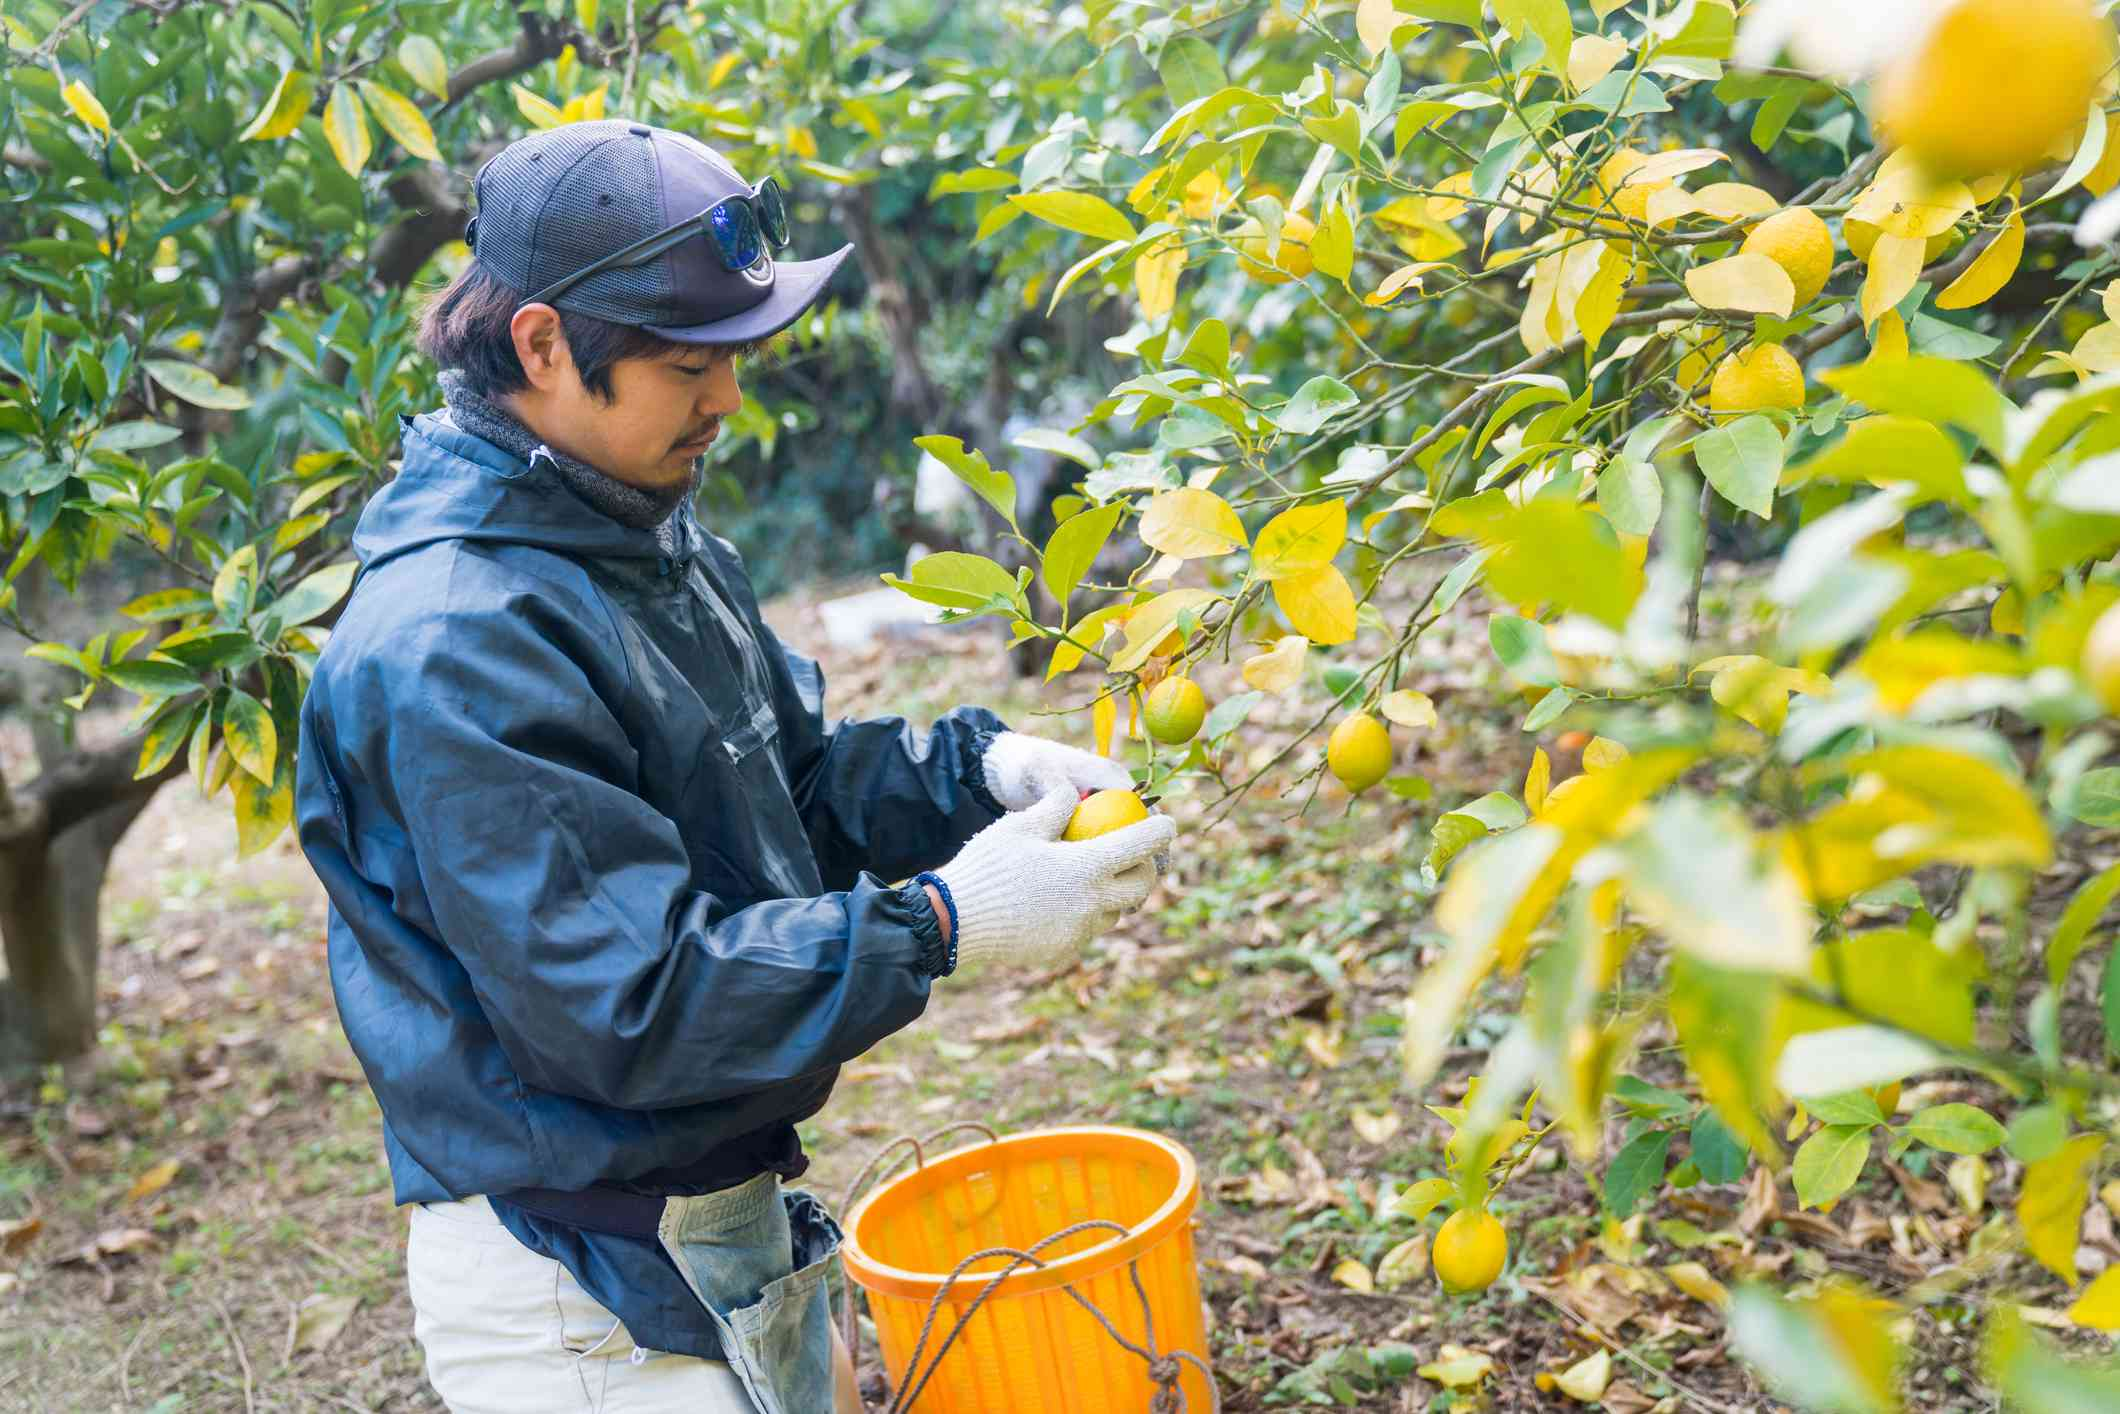 East asian Man harvest lemons from a tree